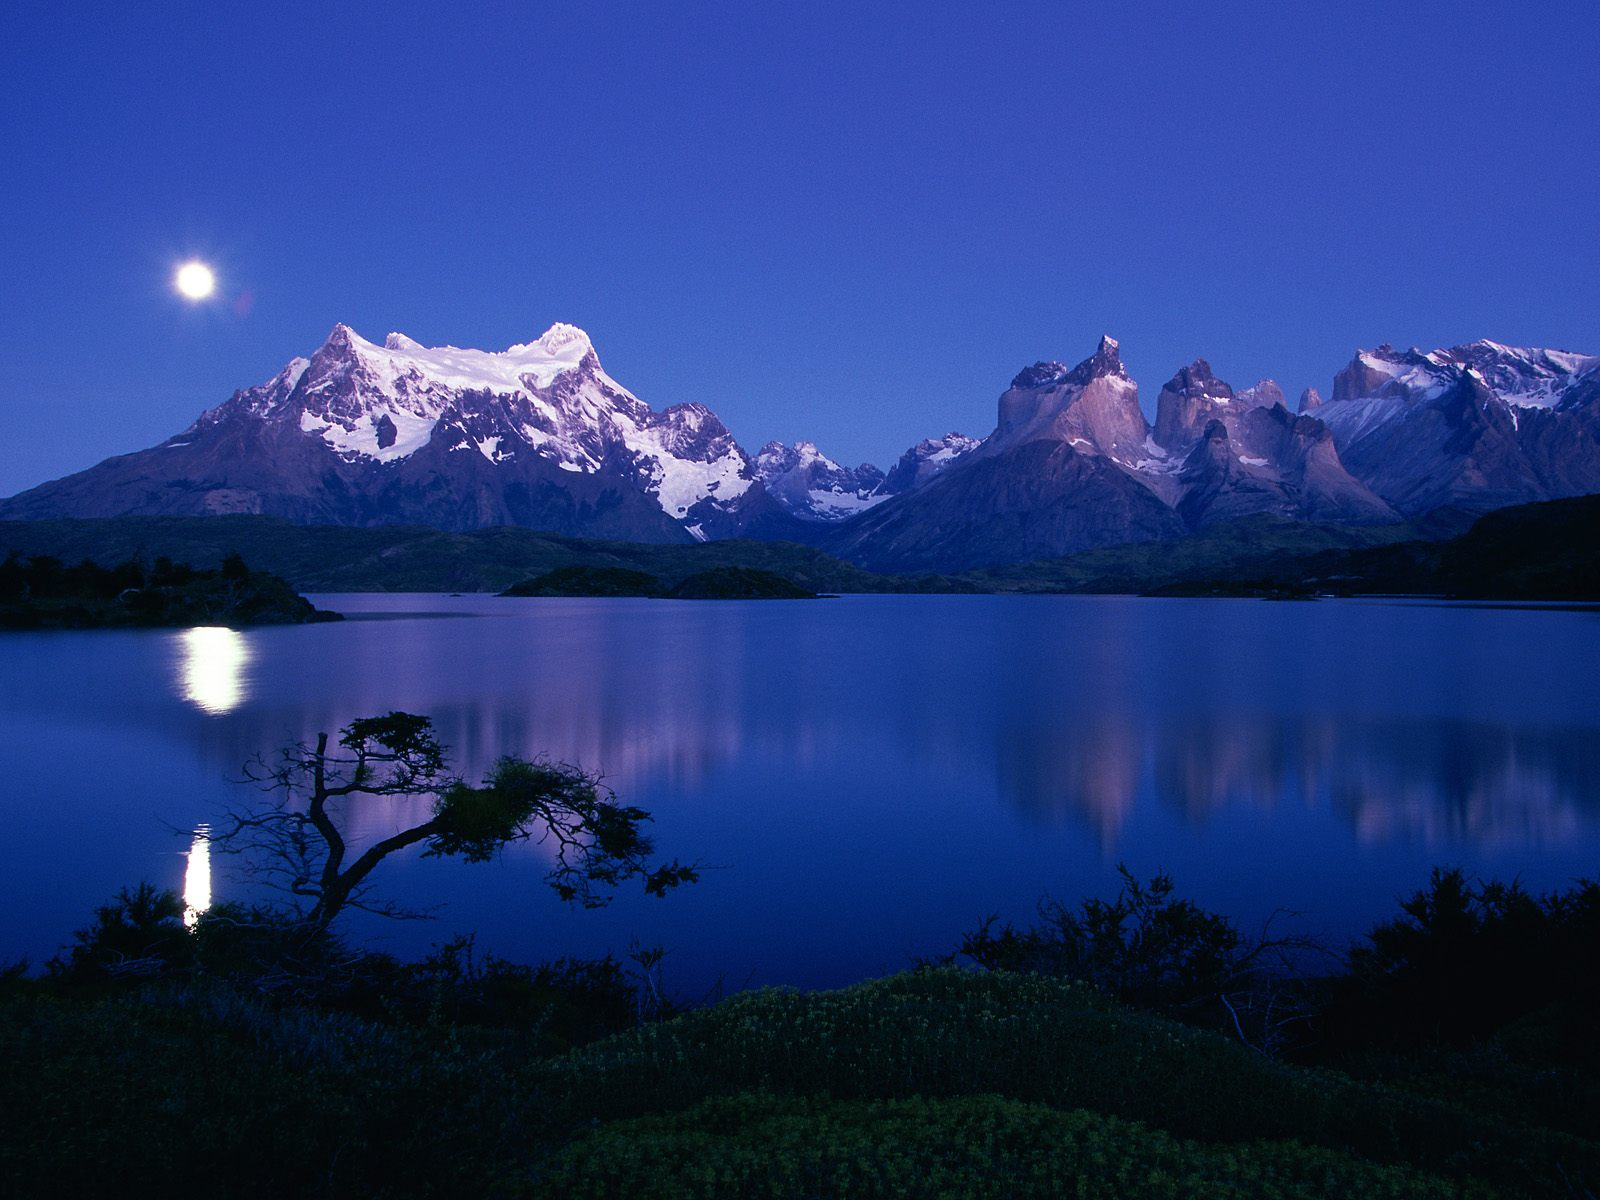 http://4.bp.blogspot.com/-y2Zi8uBGPIQ/TbWhdHrop2I/AAAAAAAACeY/rSaO1sm8Zlg/s1600/1213511916_lake-pehoe-torres-del-paine-national.jpg